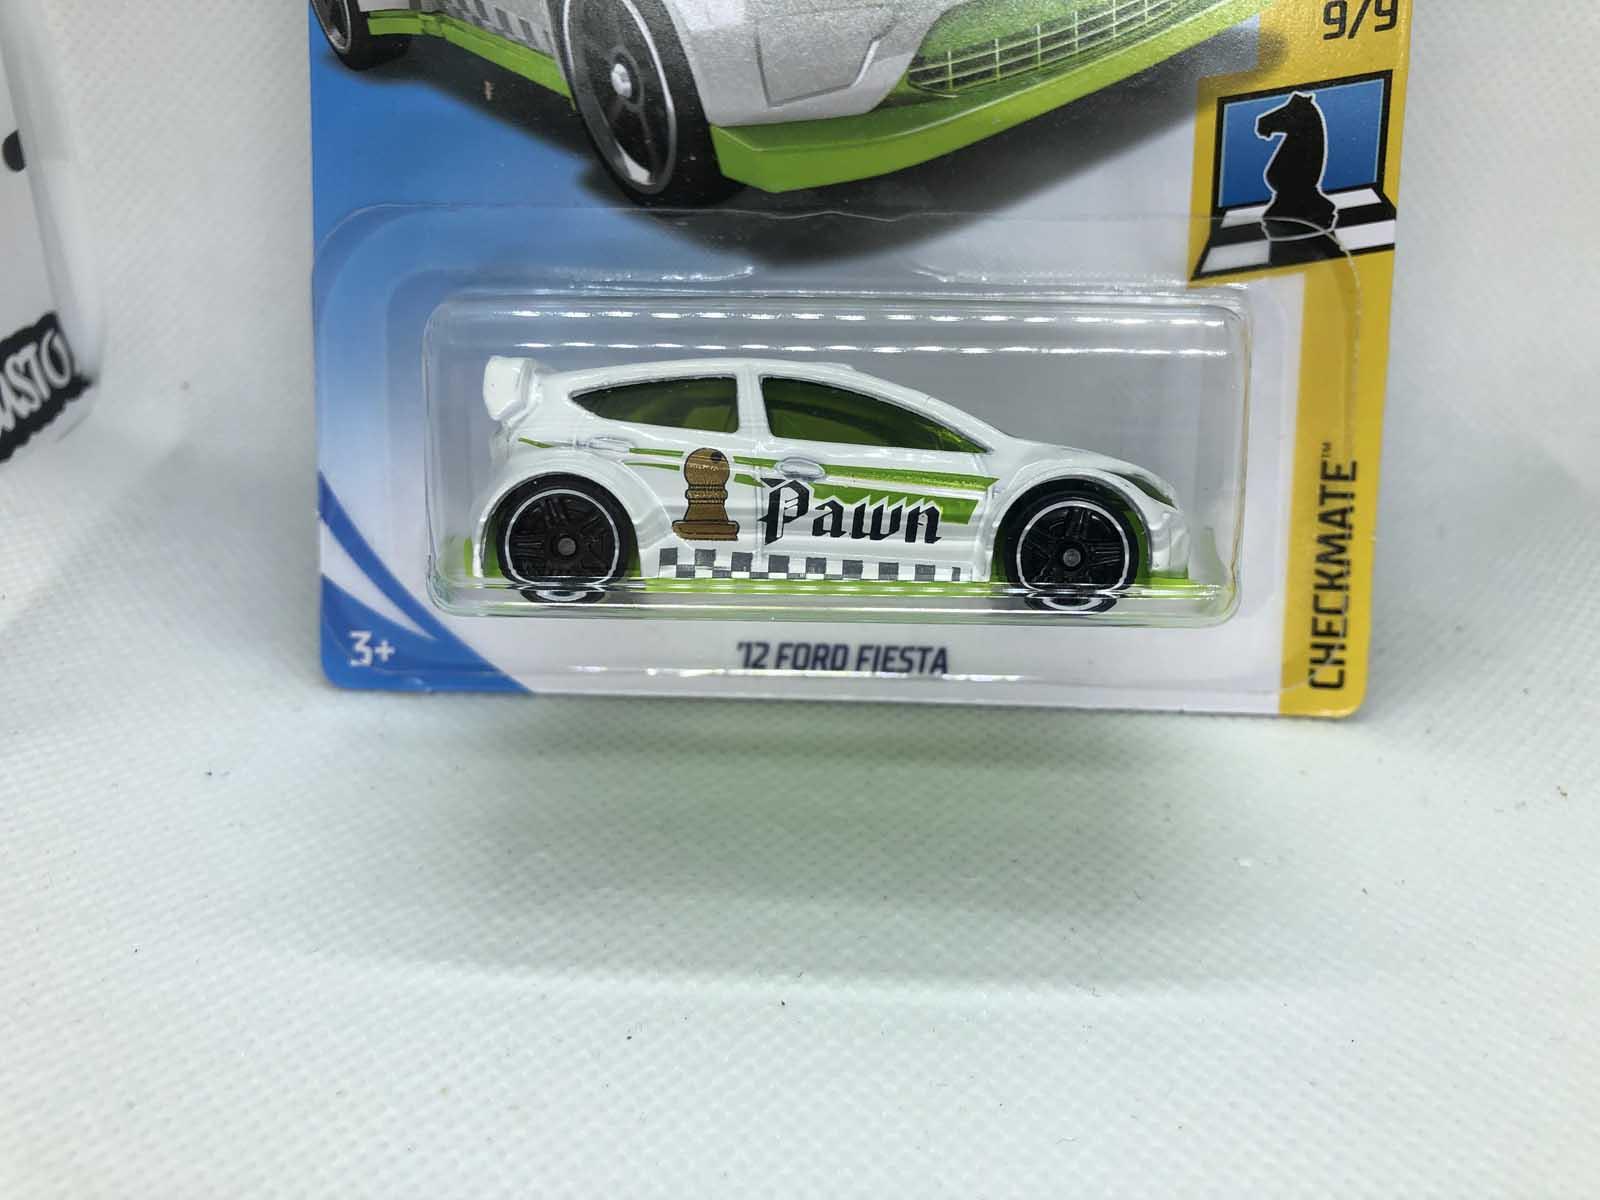 12 Ford Fiesta